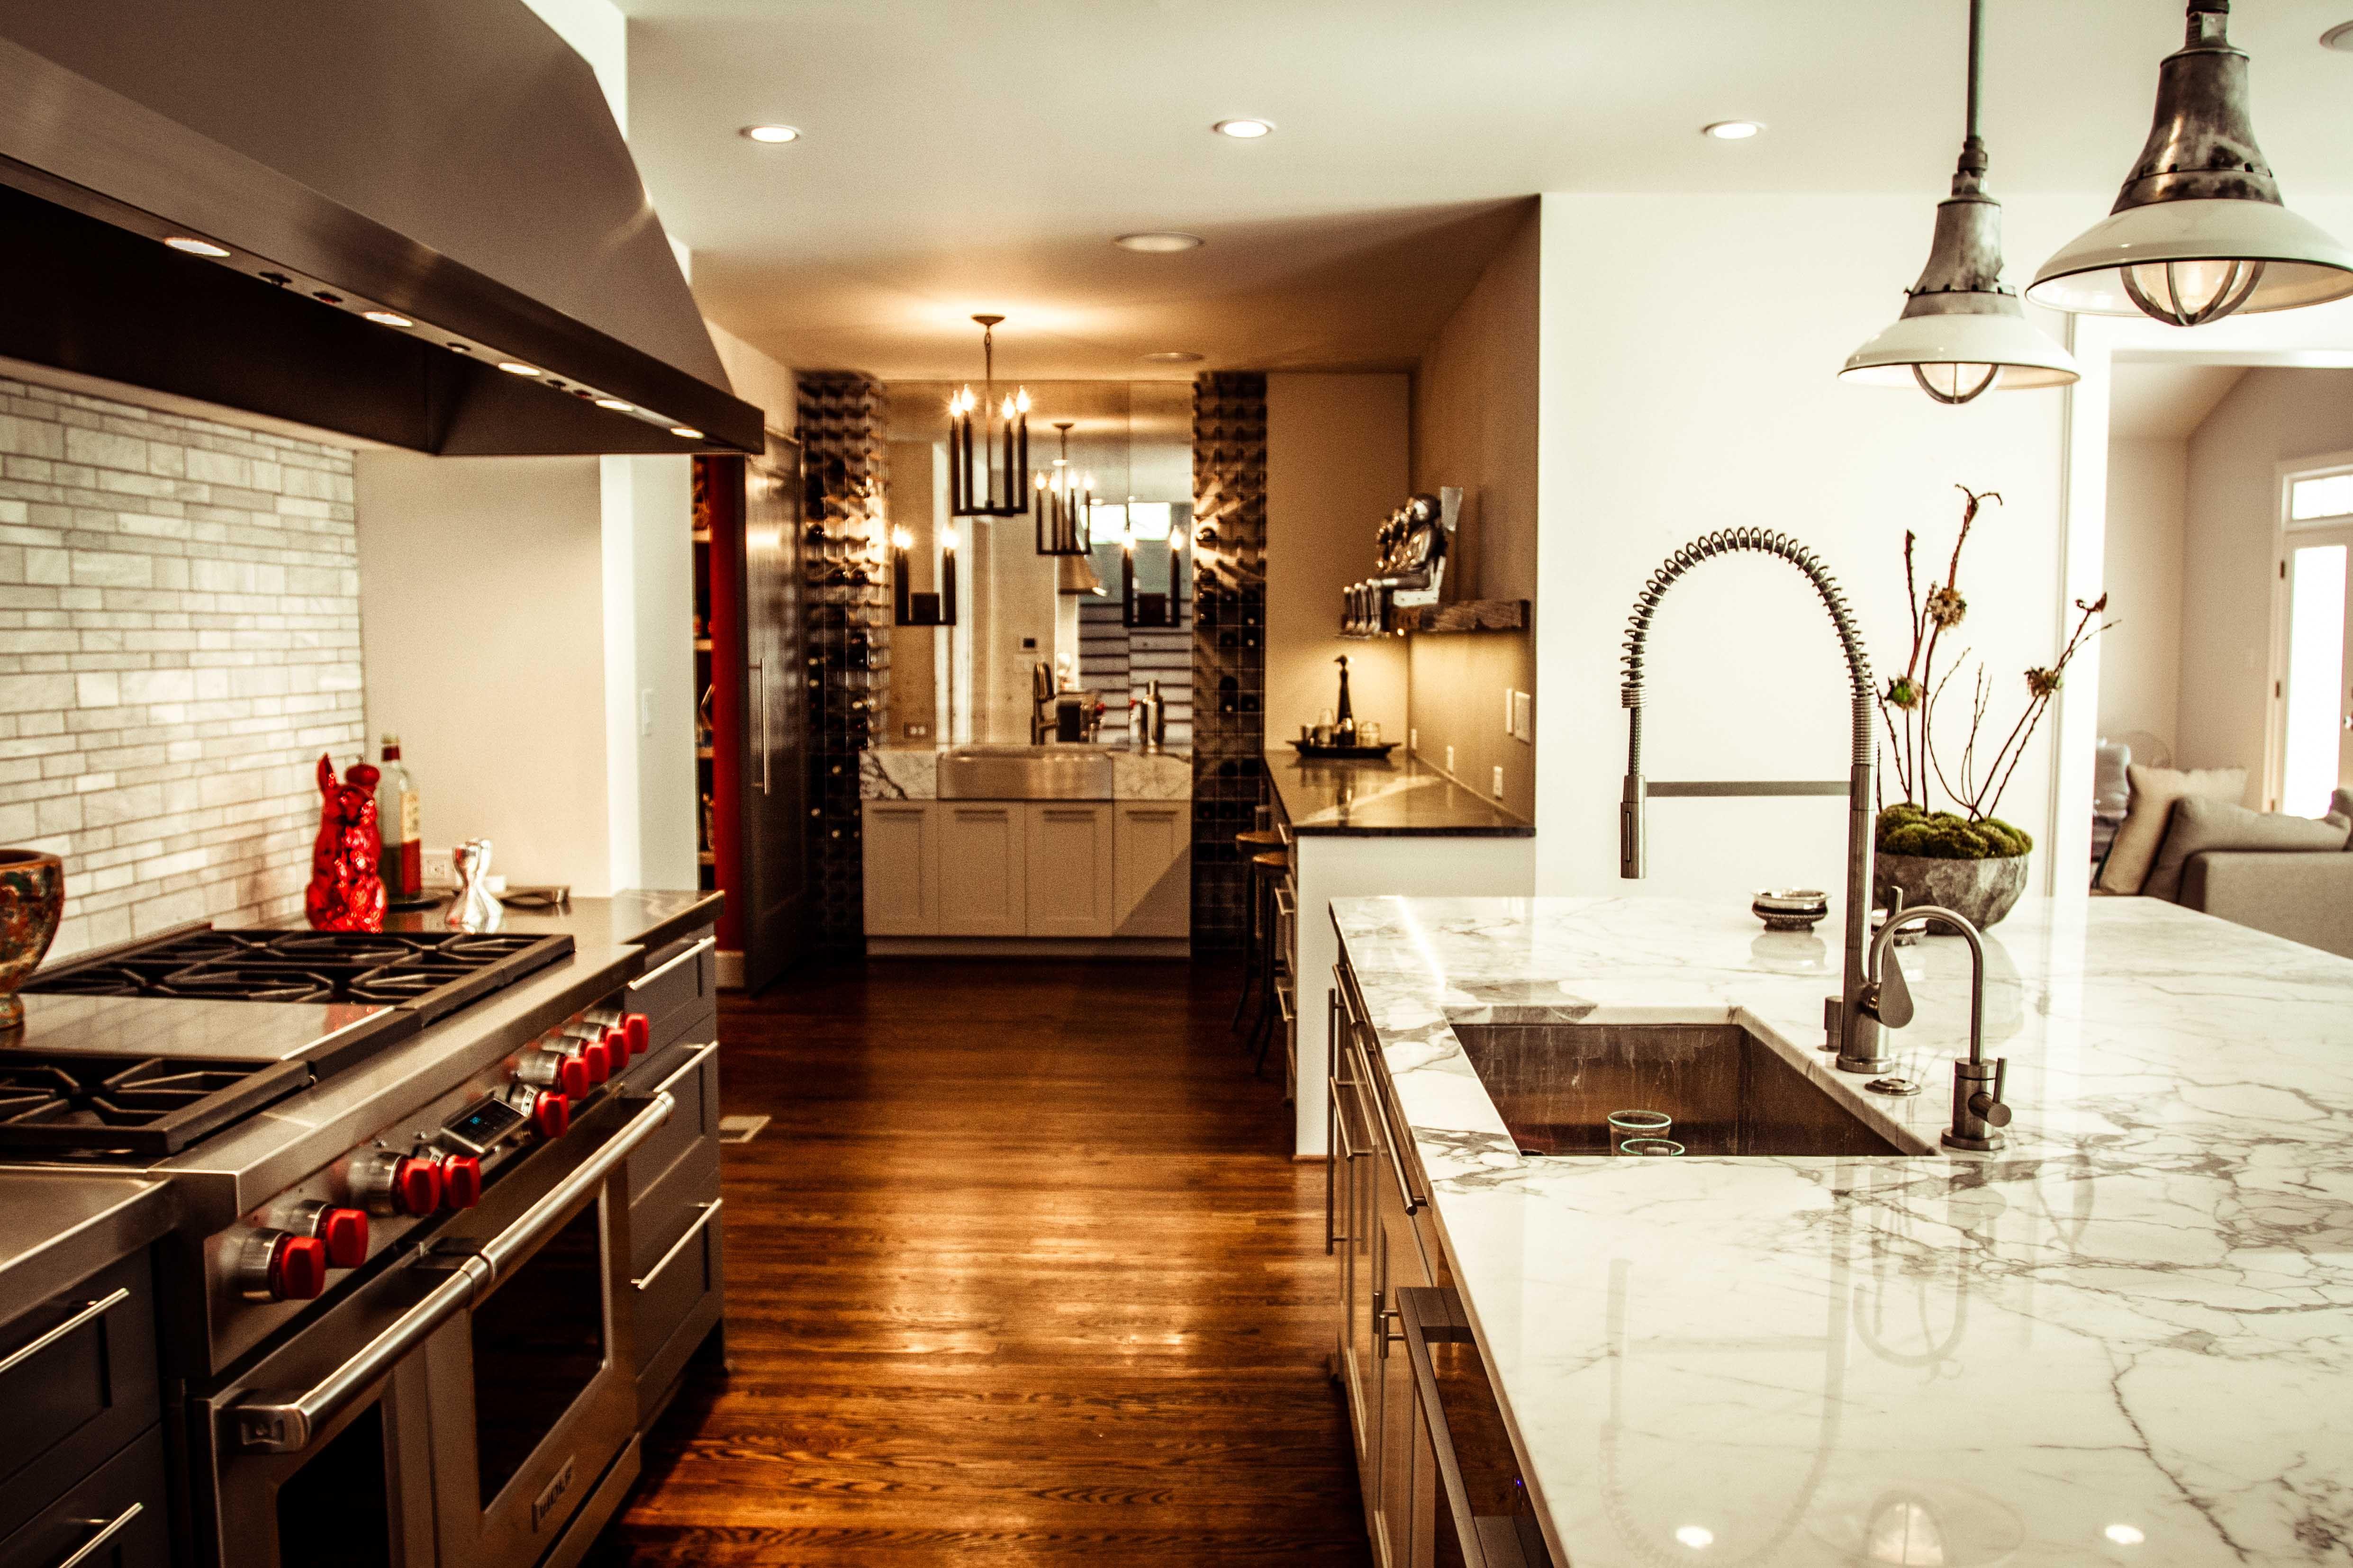 hansgrohe axor citterio semi pro kitchen faucet small kitchen decor custom kitchen island small kitchen lighting